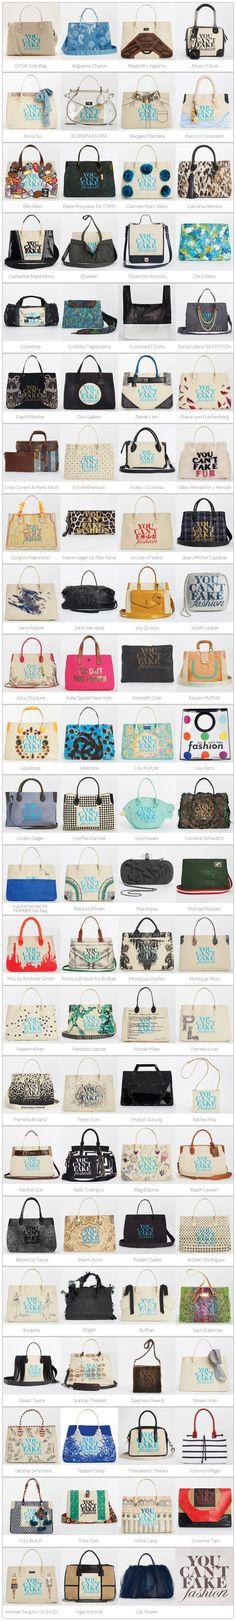 eBay x CFDA limited edition designer totes. #ebayfashion #ycff2013 #youcantfakefashion